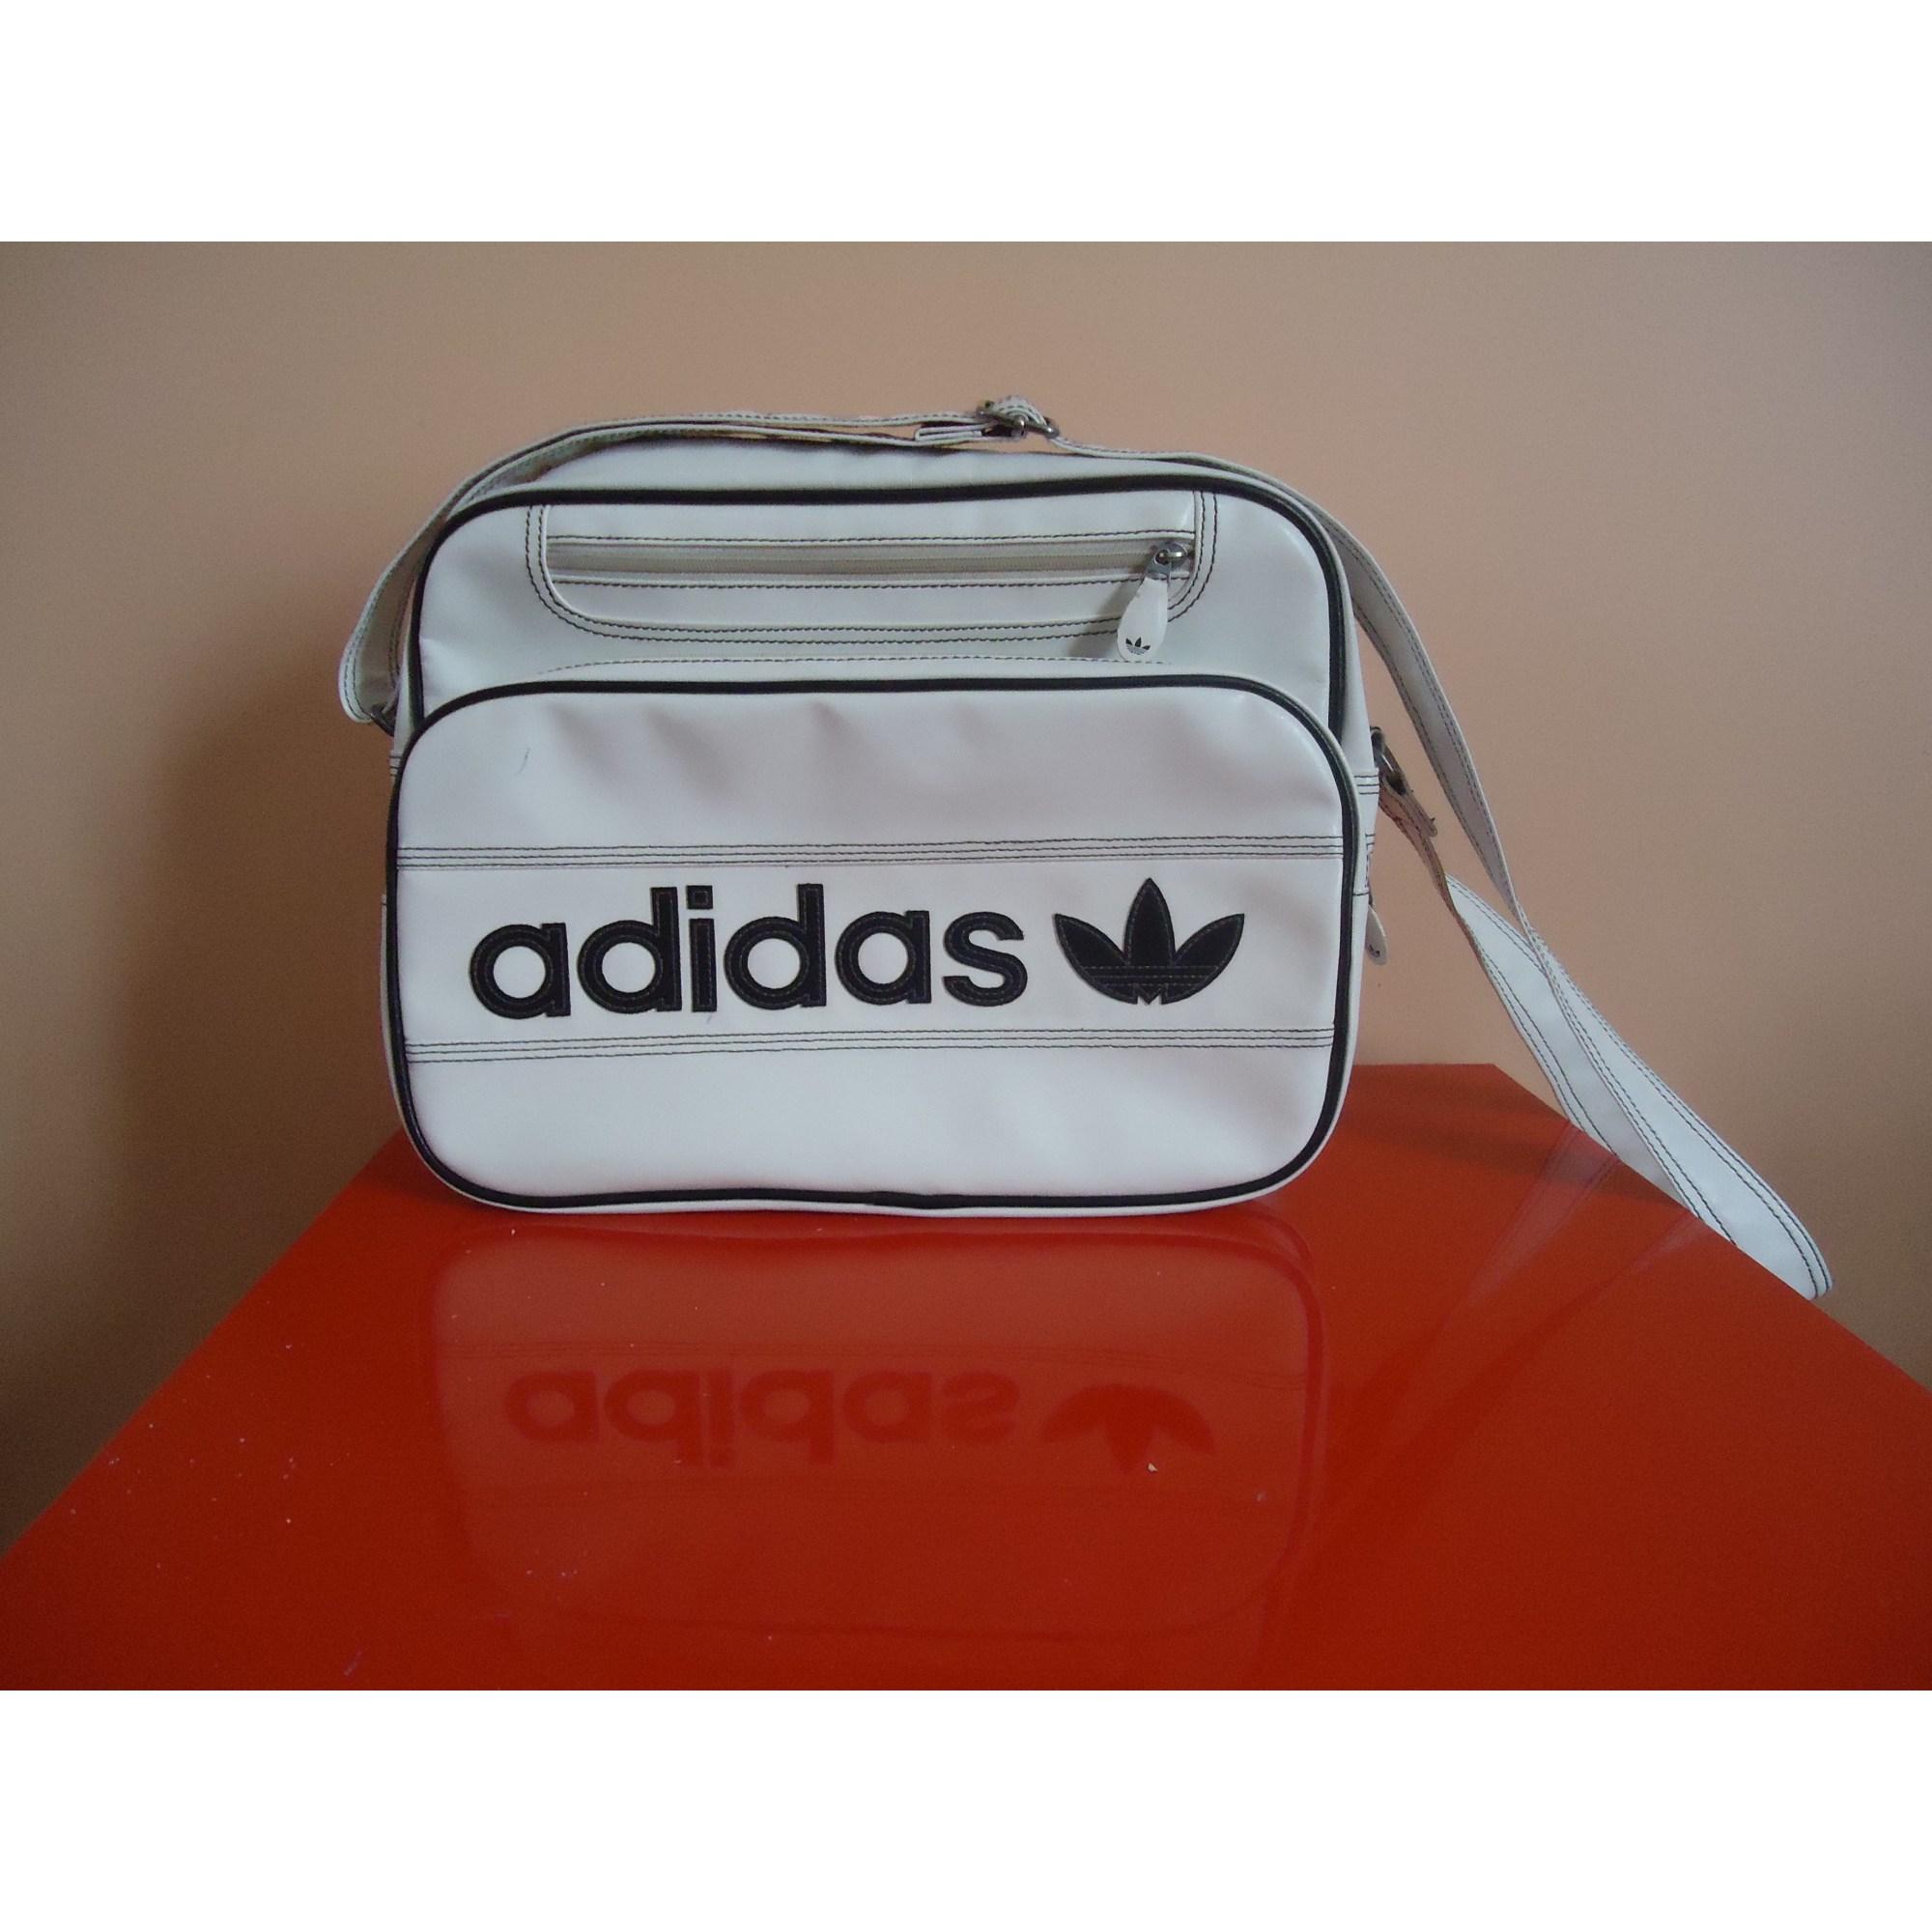 sac adidas blanc et noir